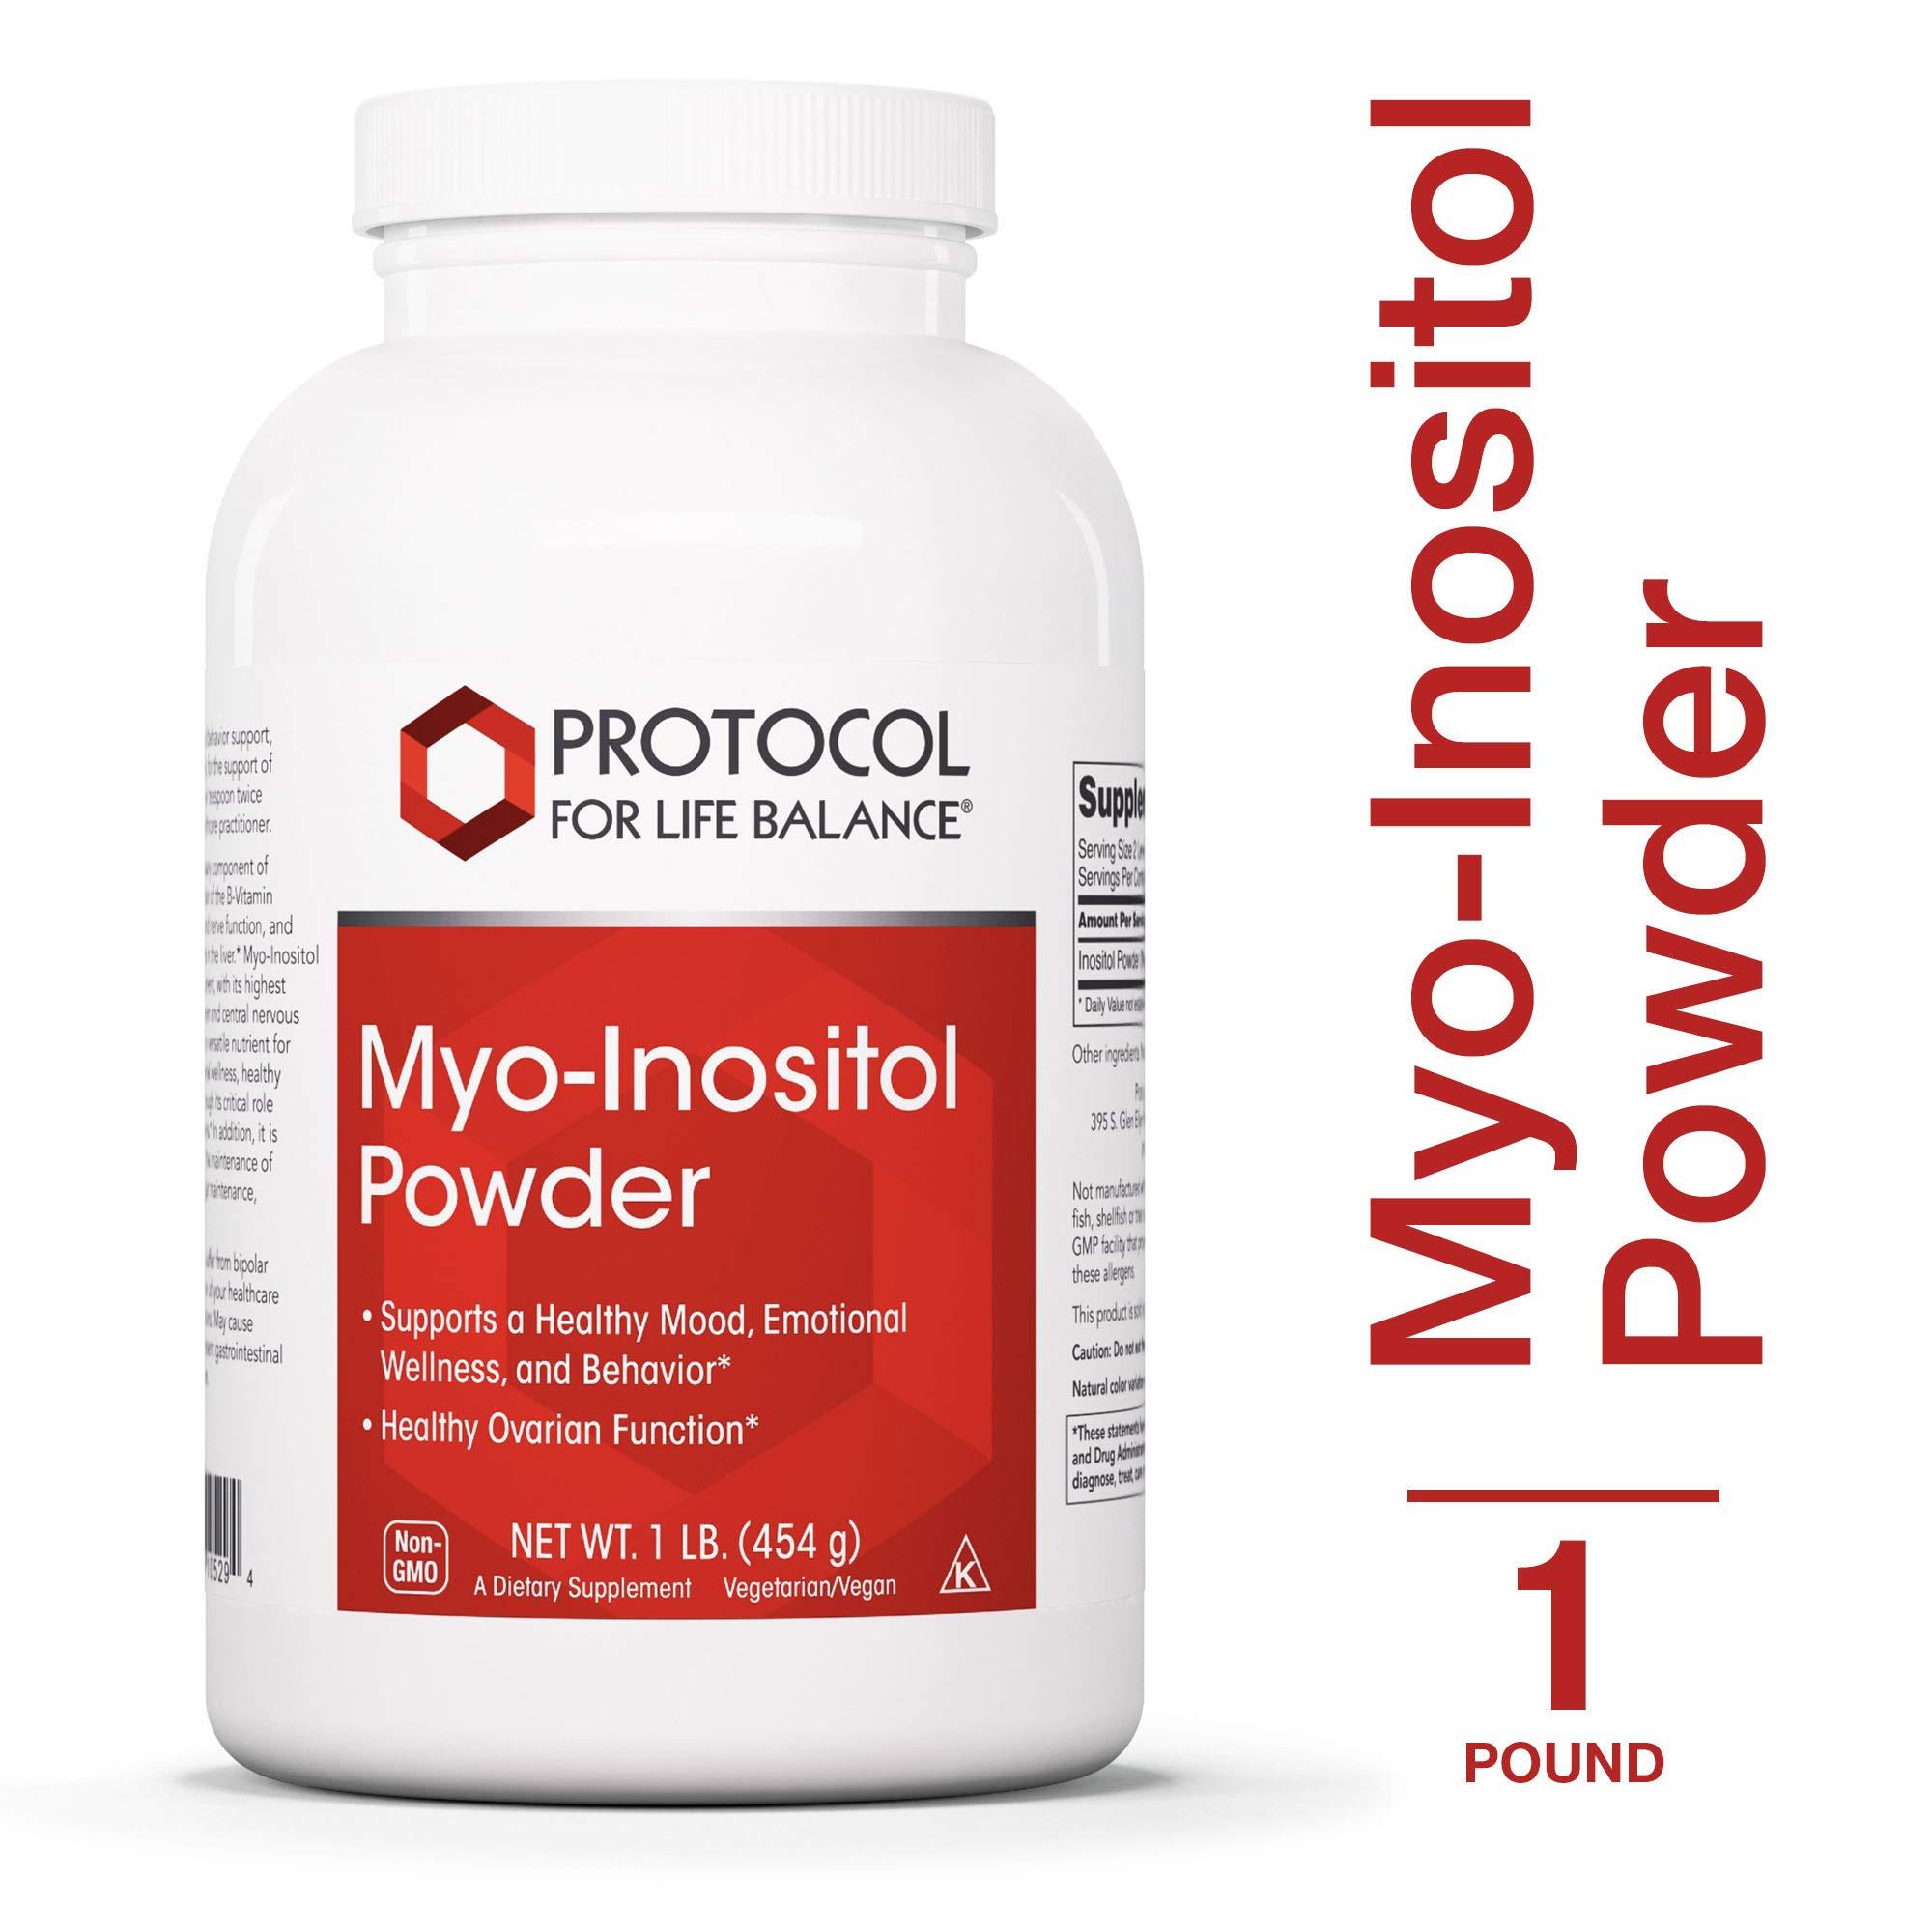 Protocol For Life Balance - Myo-Inositol Powder - Supports a Healthy Mood, Emotional Wellness, Behavior and Ovarian Function, Energy Boost, Sleep Support - 1lb. (454 g) by Protocol For Life Balance